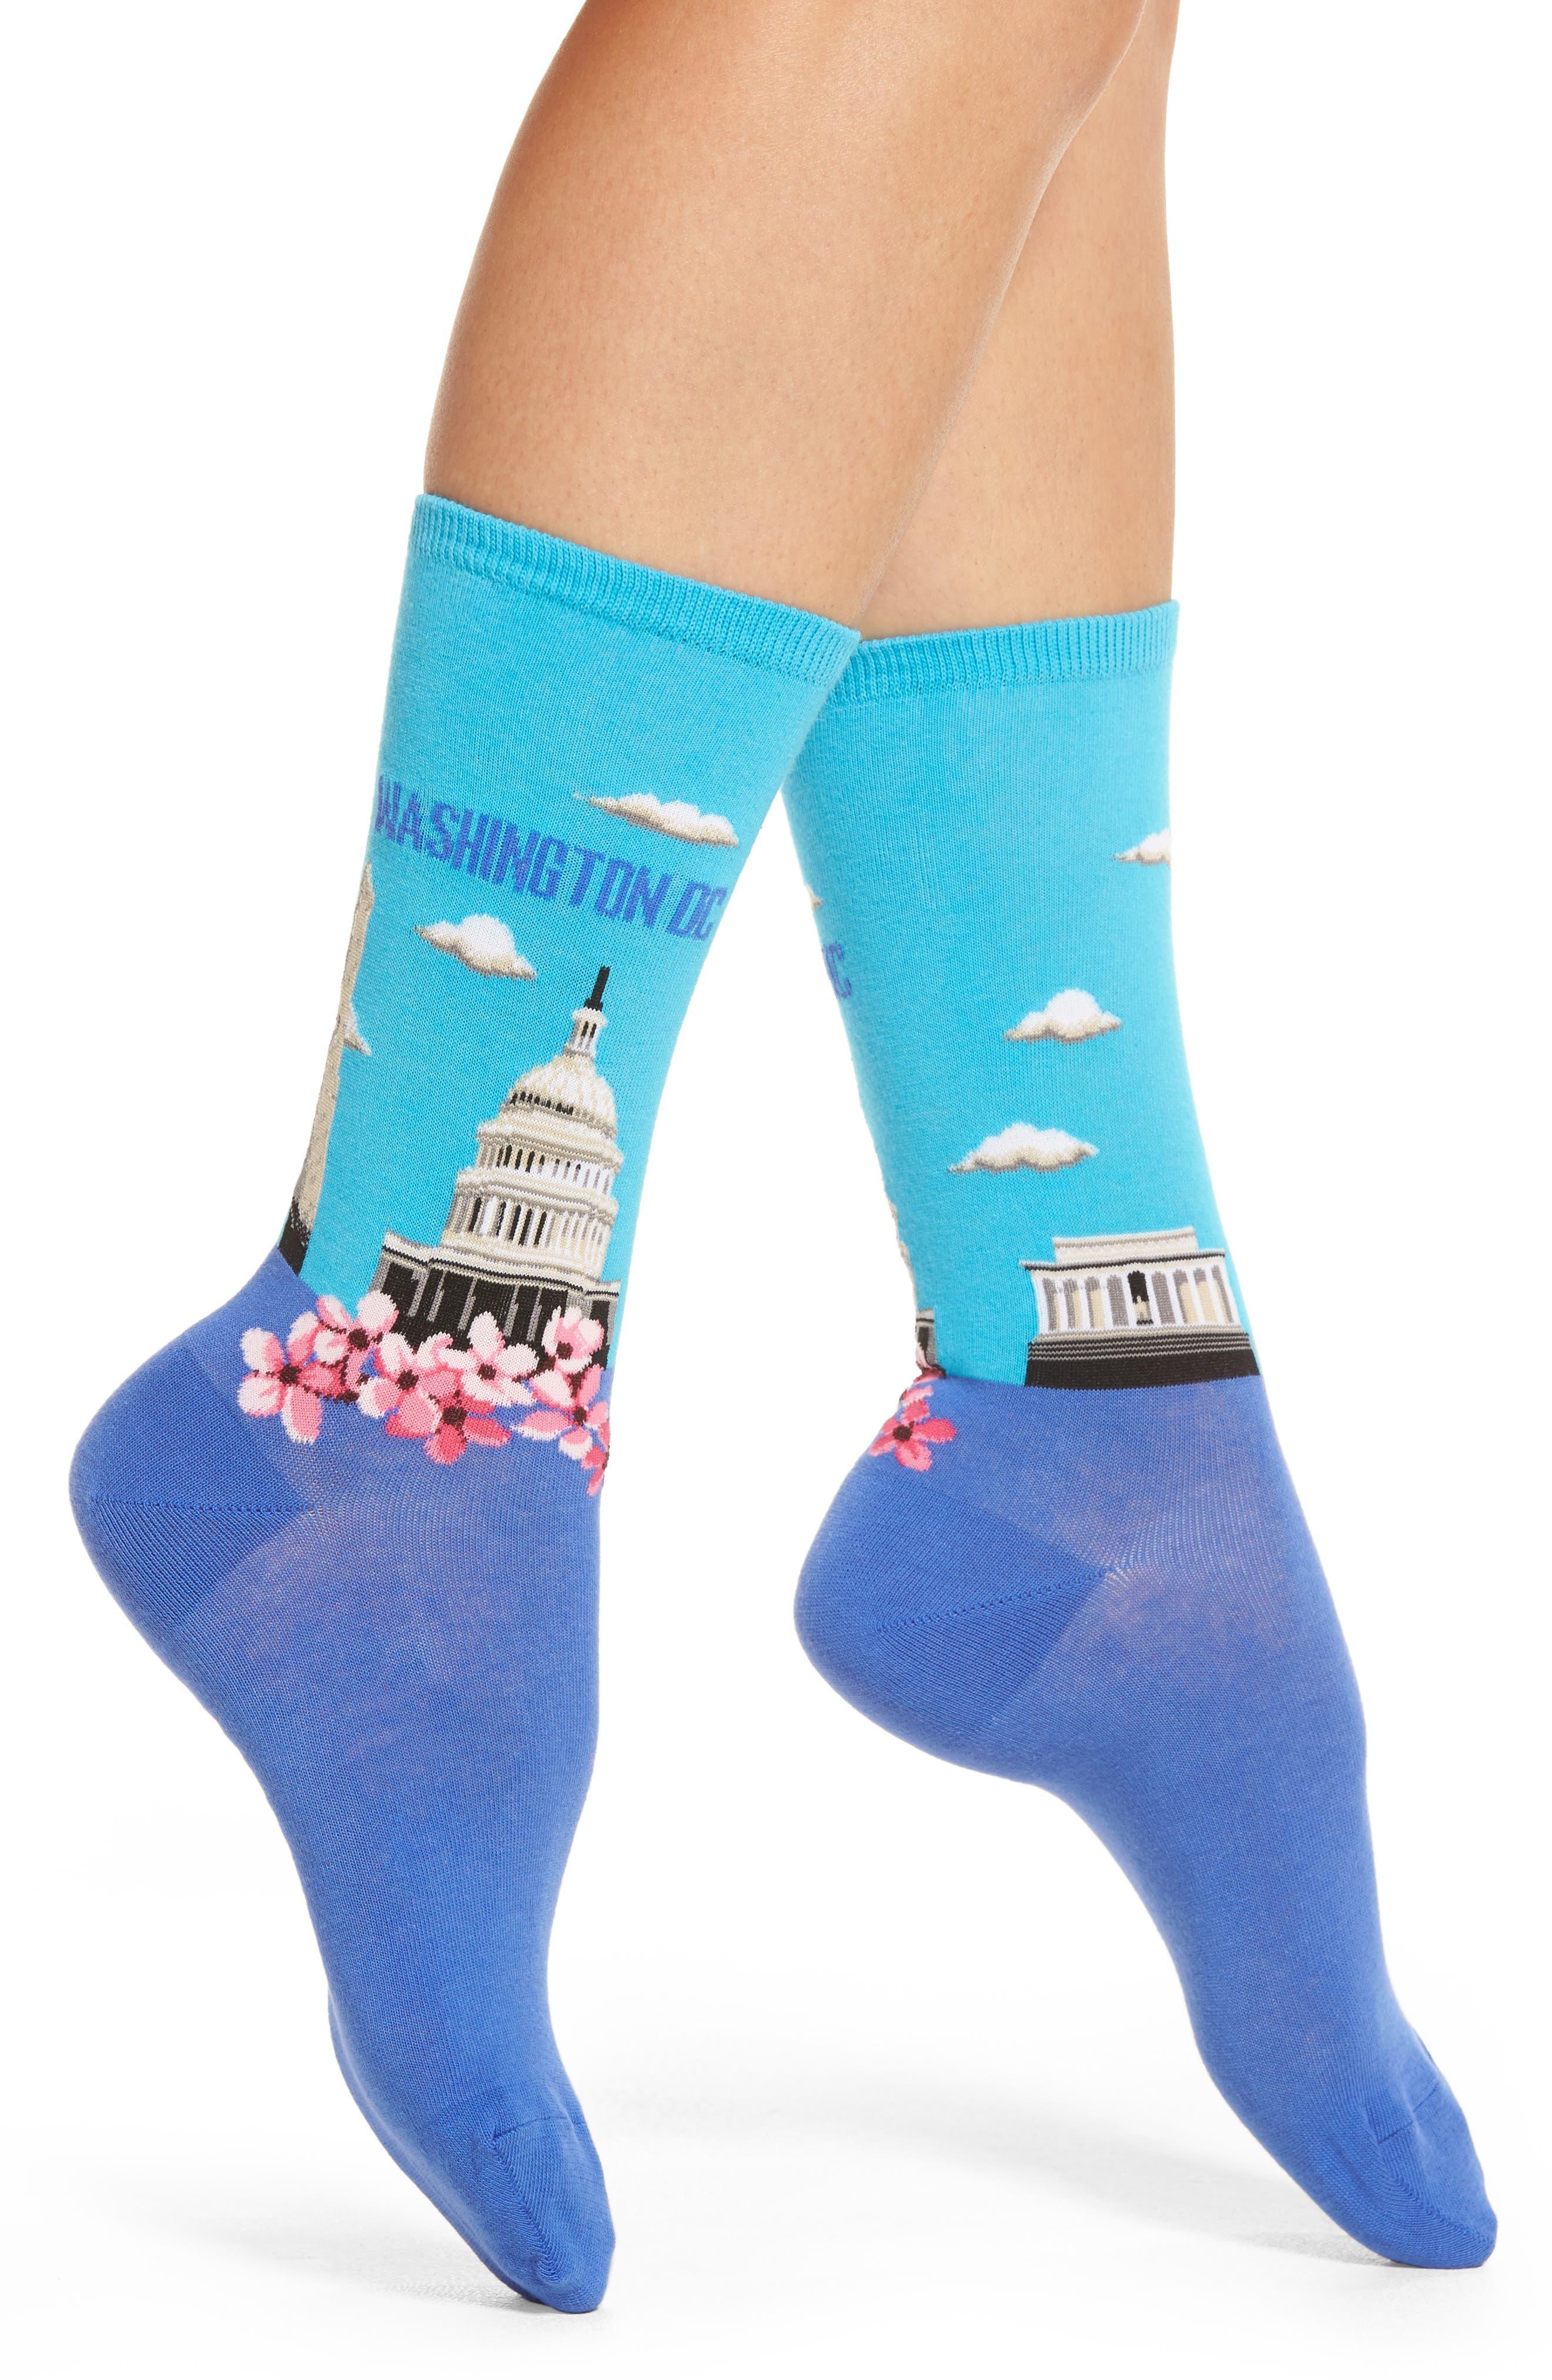 Washington DC Crew Socks,                         Main,                         color, Light Blue